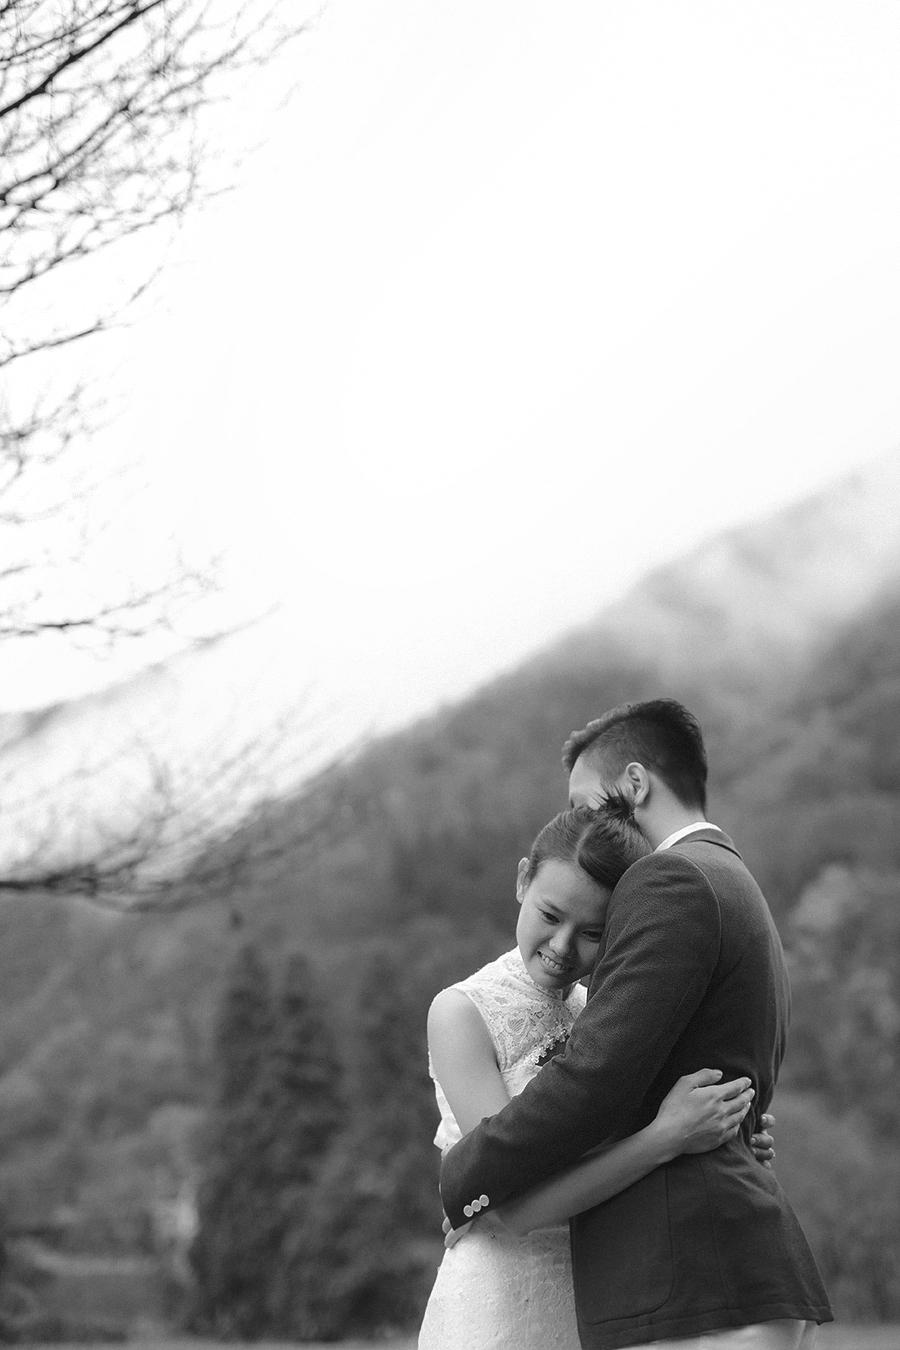 shirakawago japan . pre-wedding photography by kurt ahs . terry+zoey . 4260.jpg